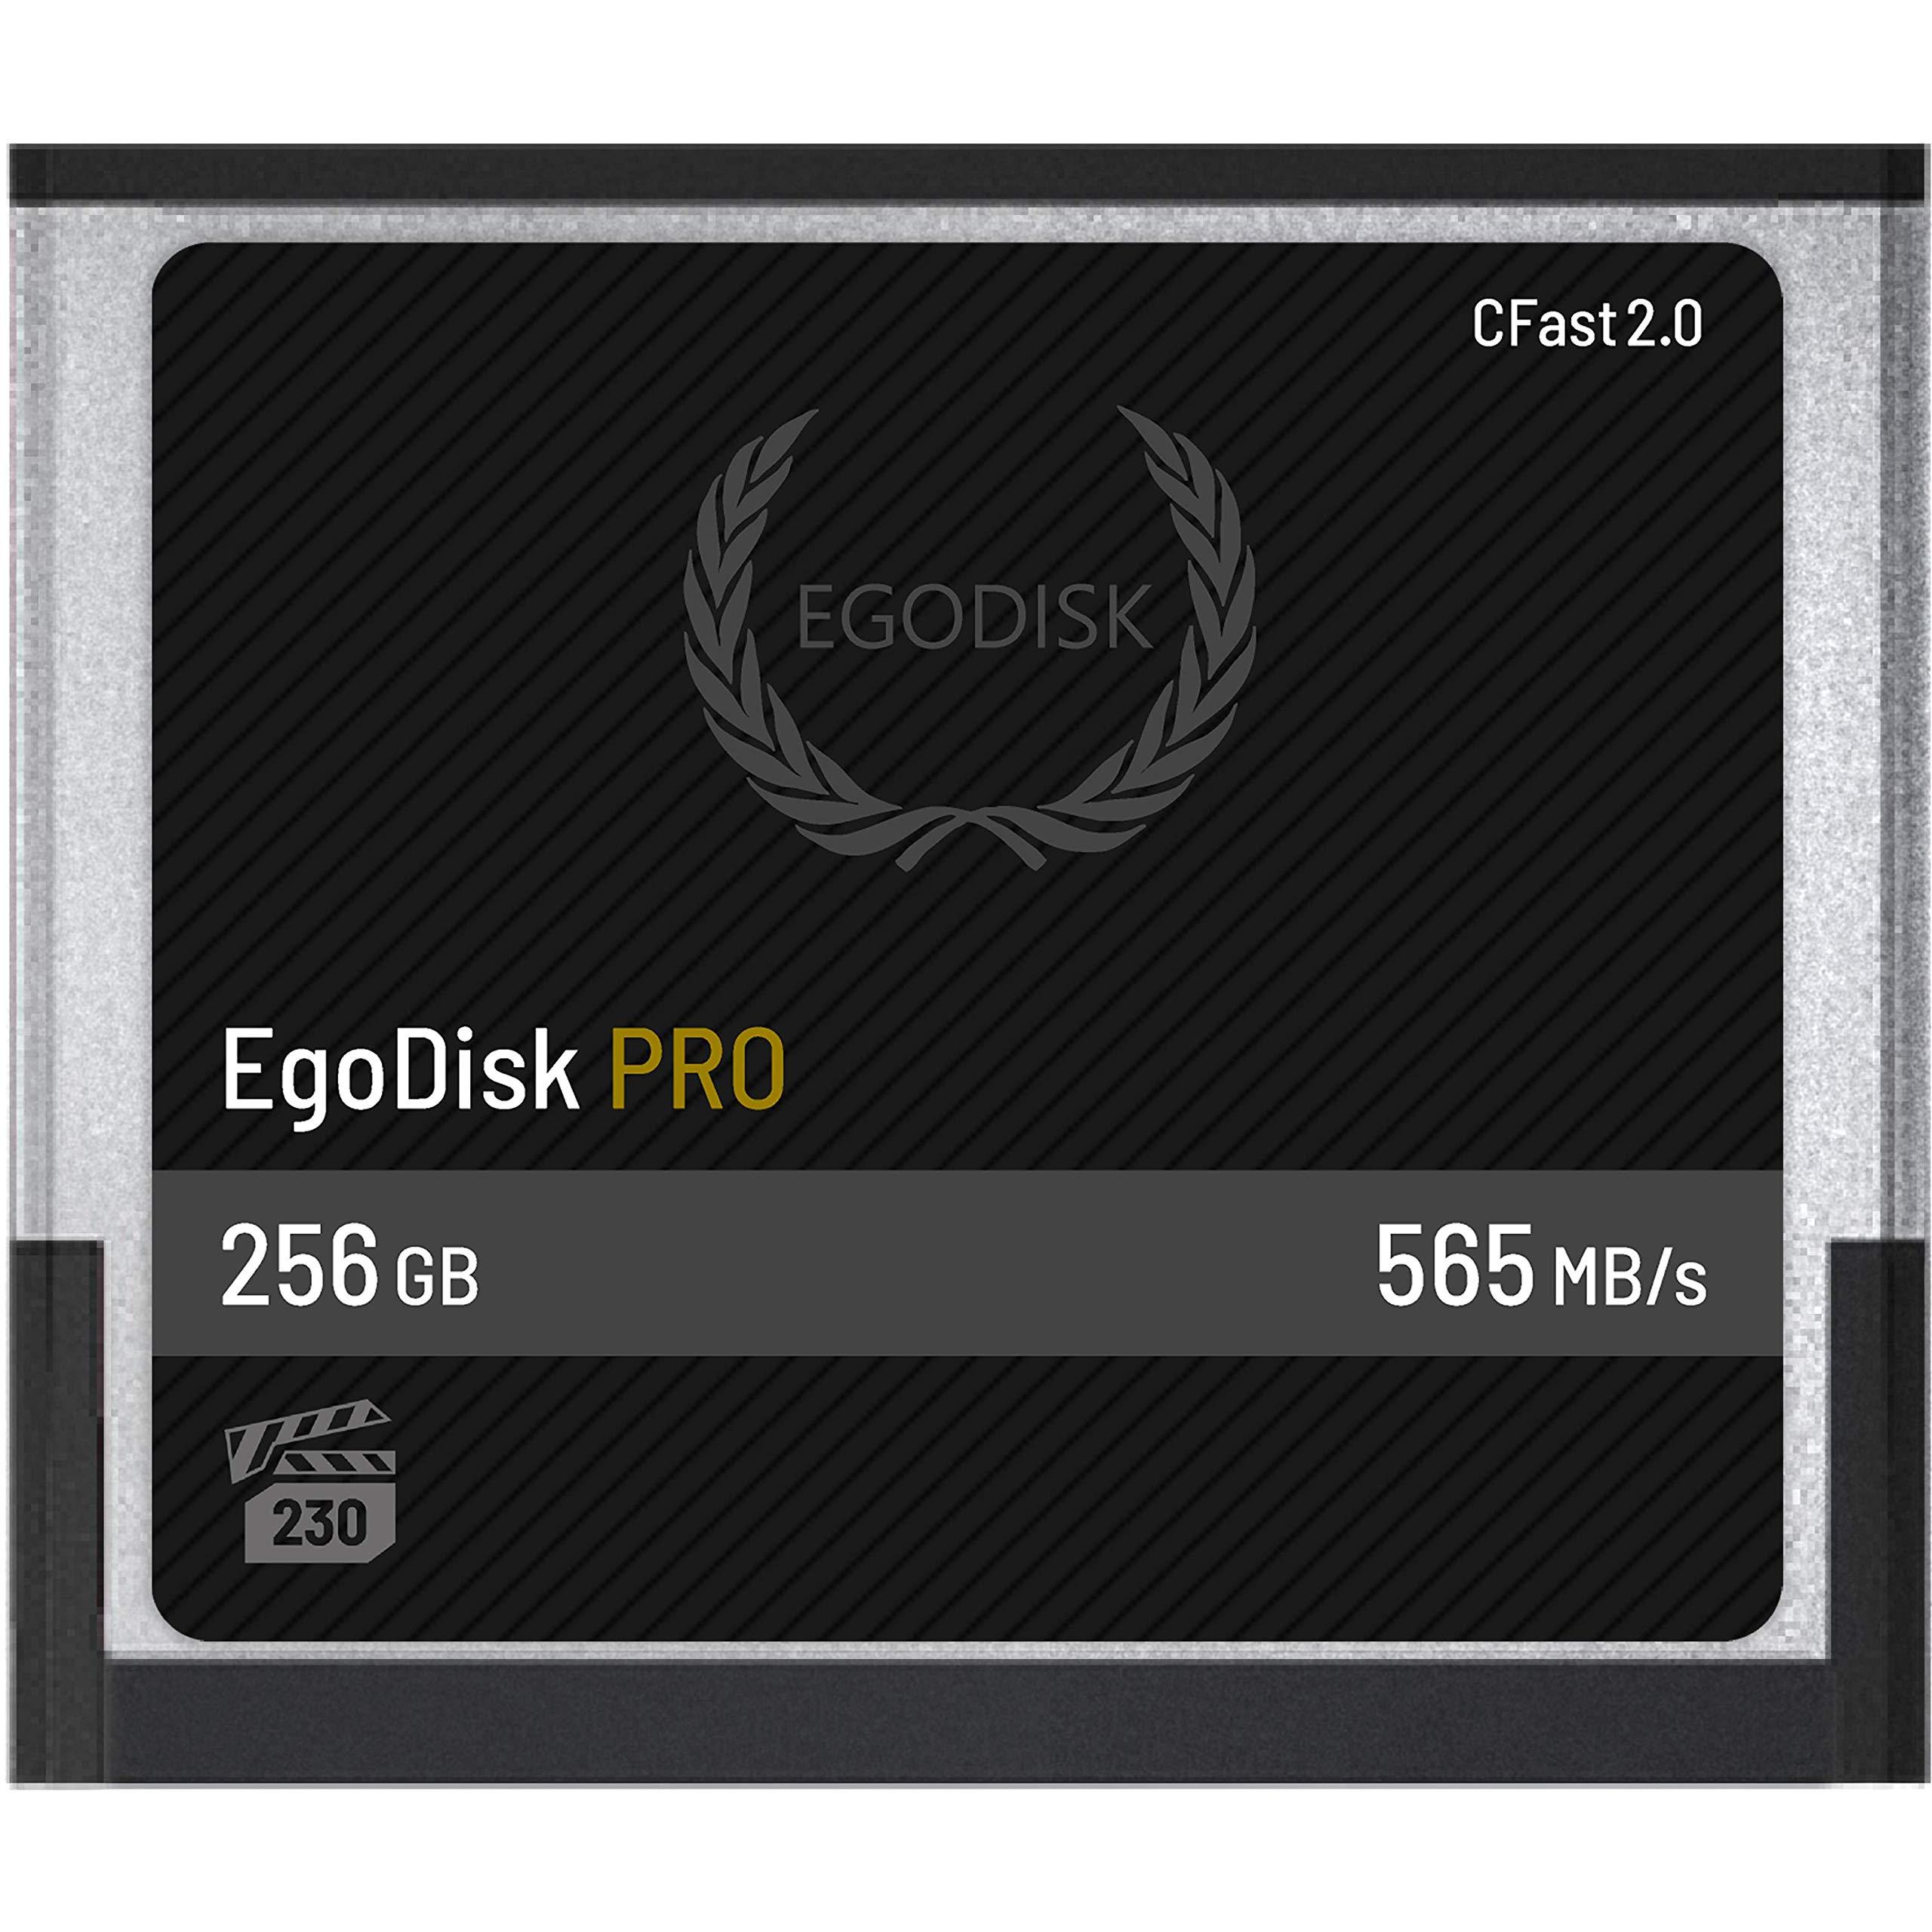 EgoDisk PRO 256GB CFast 2.0 Card - (BLACKMAGIC DESIGN URSA MINI 4K • 4.6K   CANON • XC10 • XC15 • 1DX MARK II • C200   HASSELBLAD H6D-50C • H6D-100C   ATOMOS   PHANTOM VEO S) - 3 Year Warranty by EgoDisk